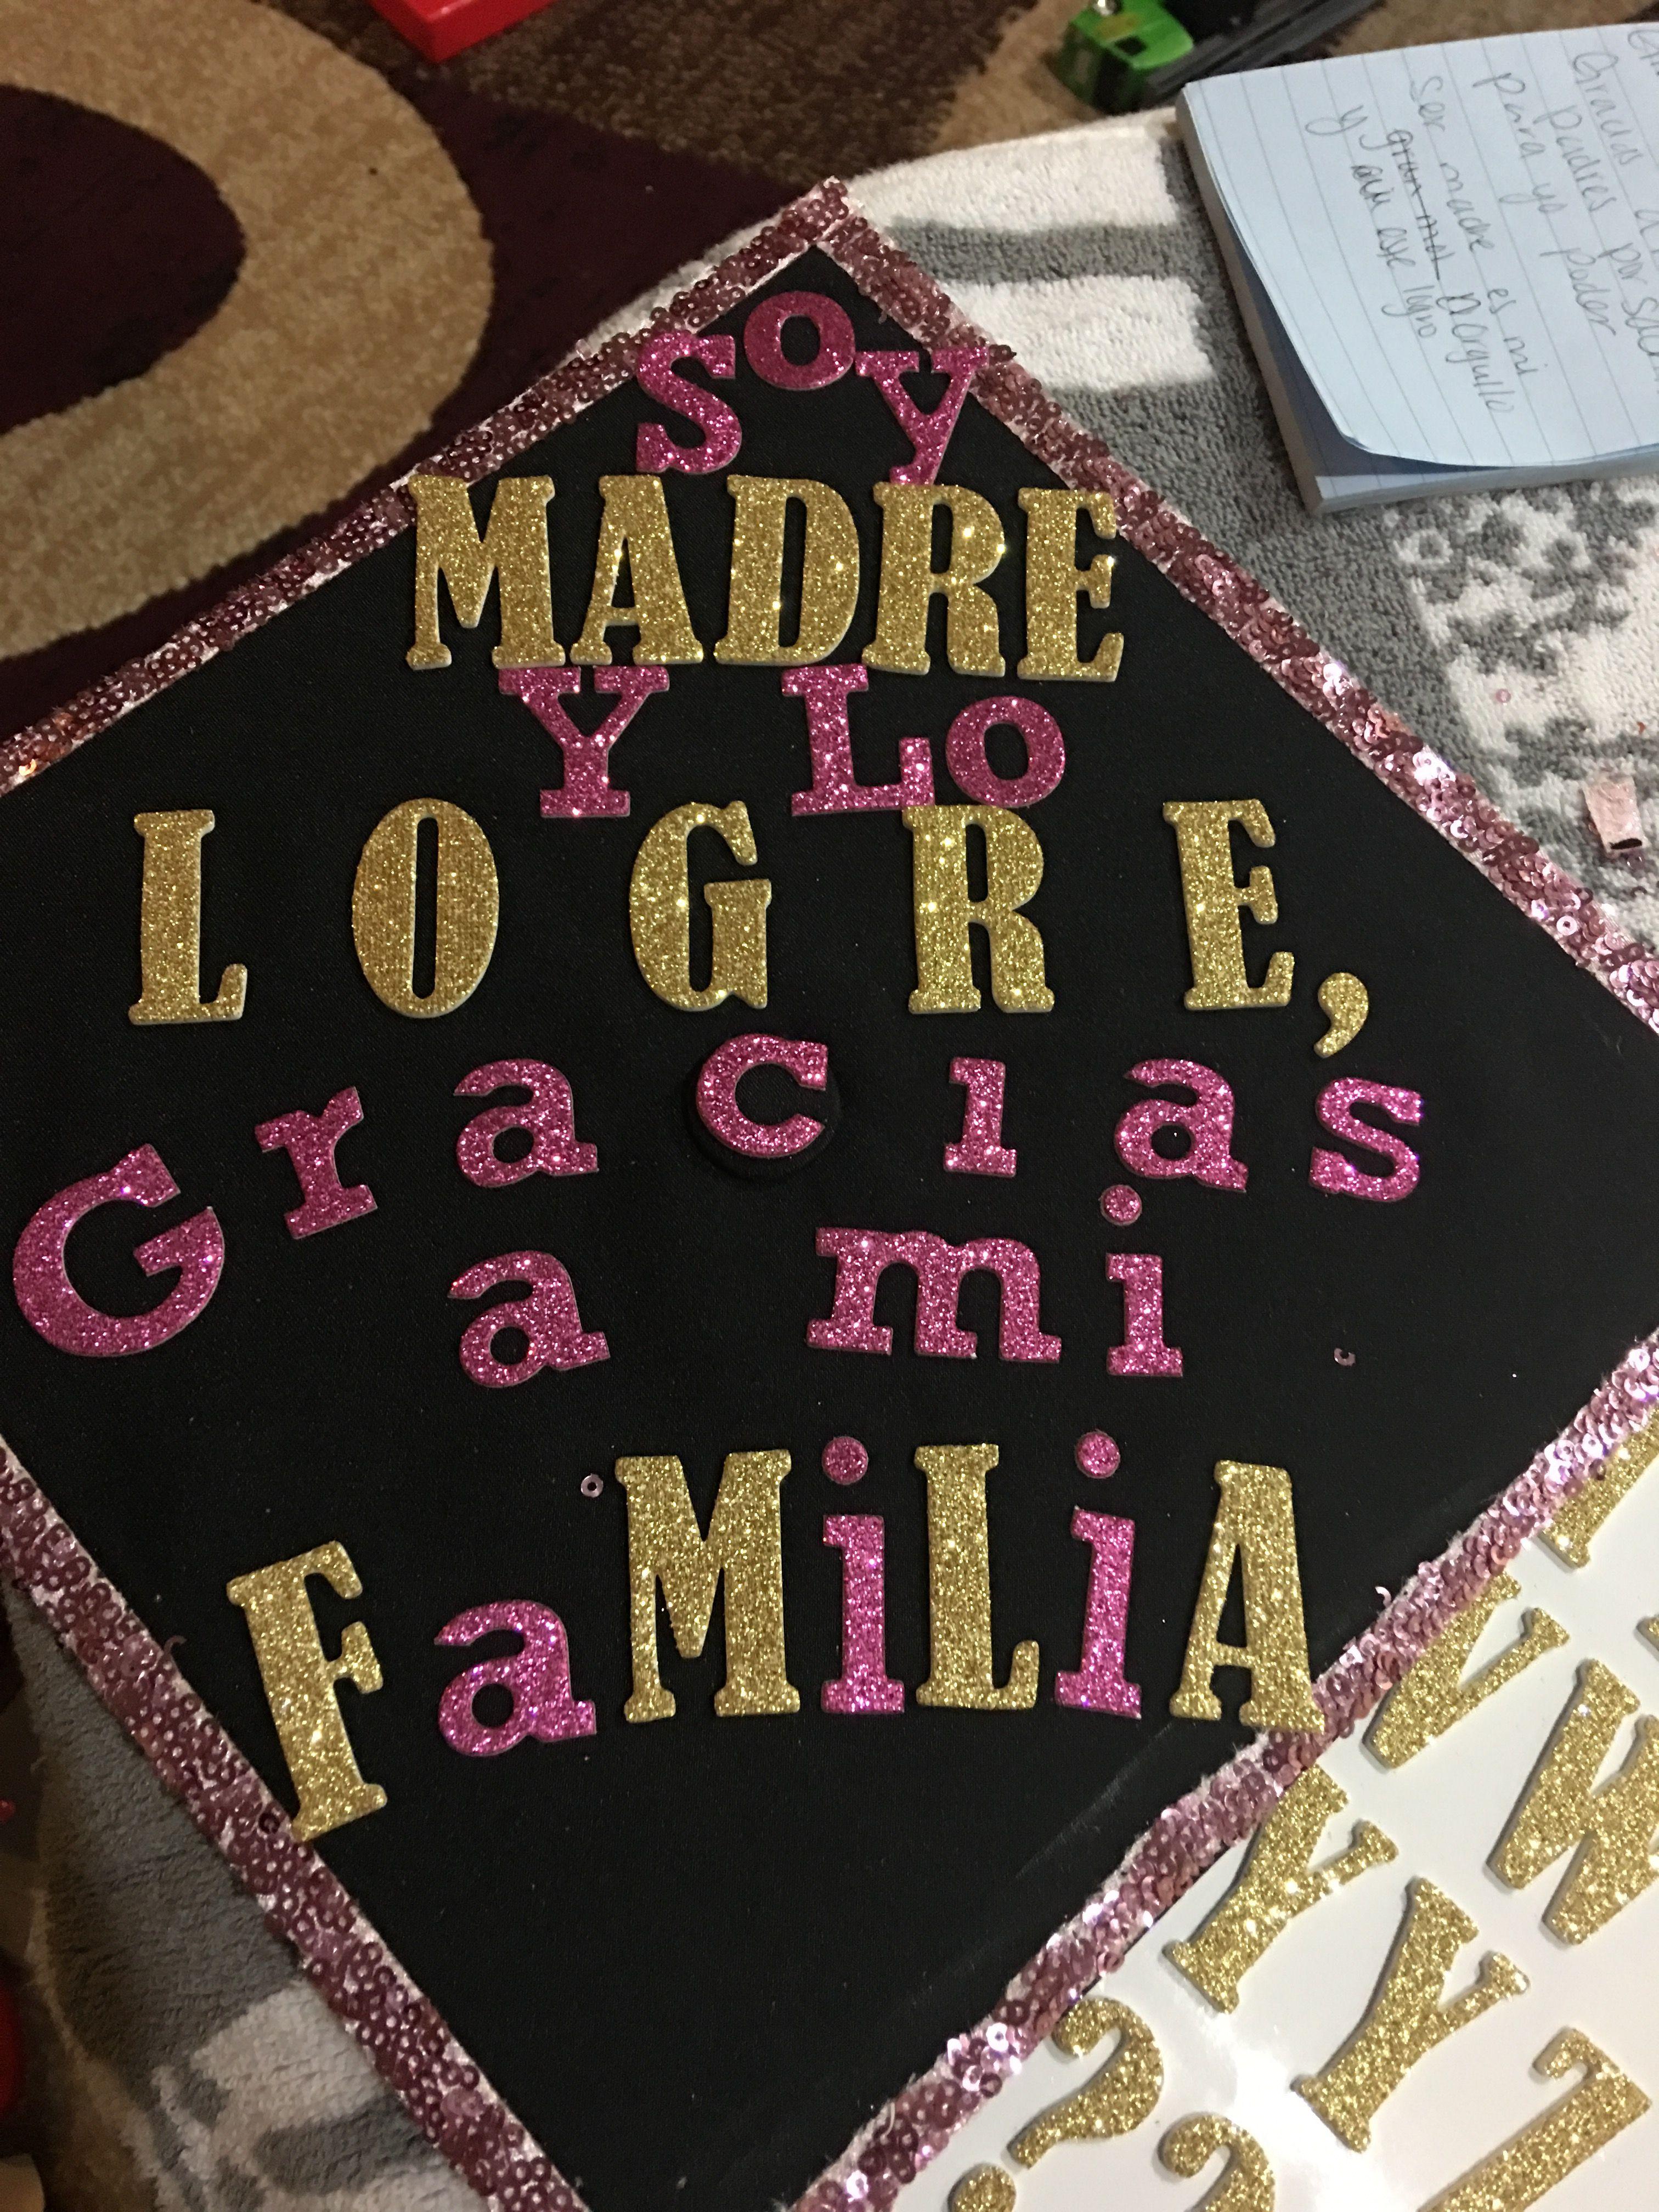 Spanish Grad Cap I M A Mother And I Did It Thanks To My Family Spanish Grad Caps Grad Cap Cap